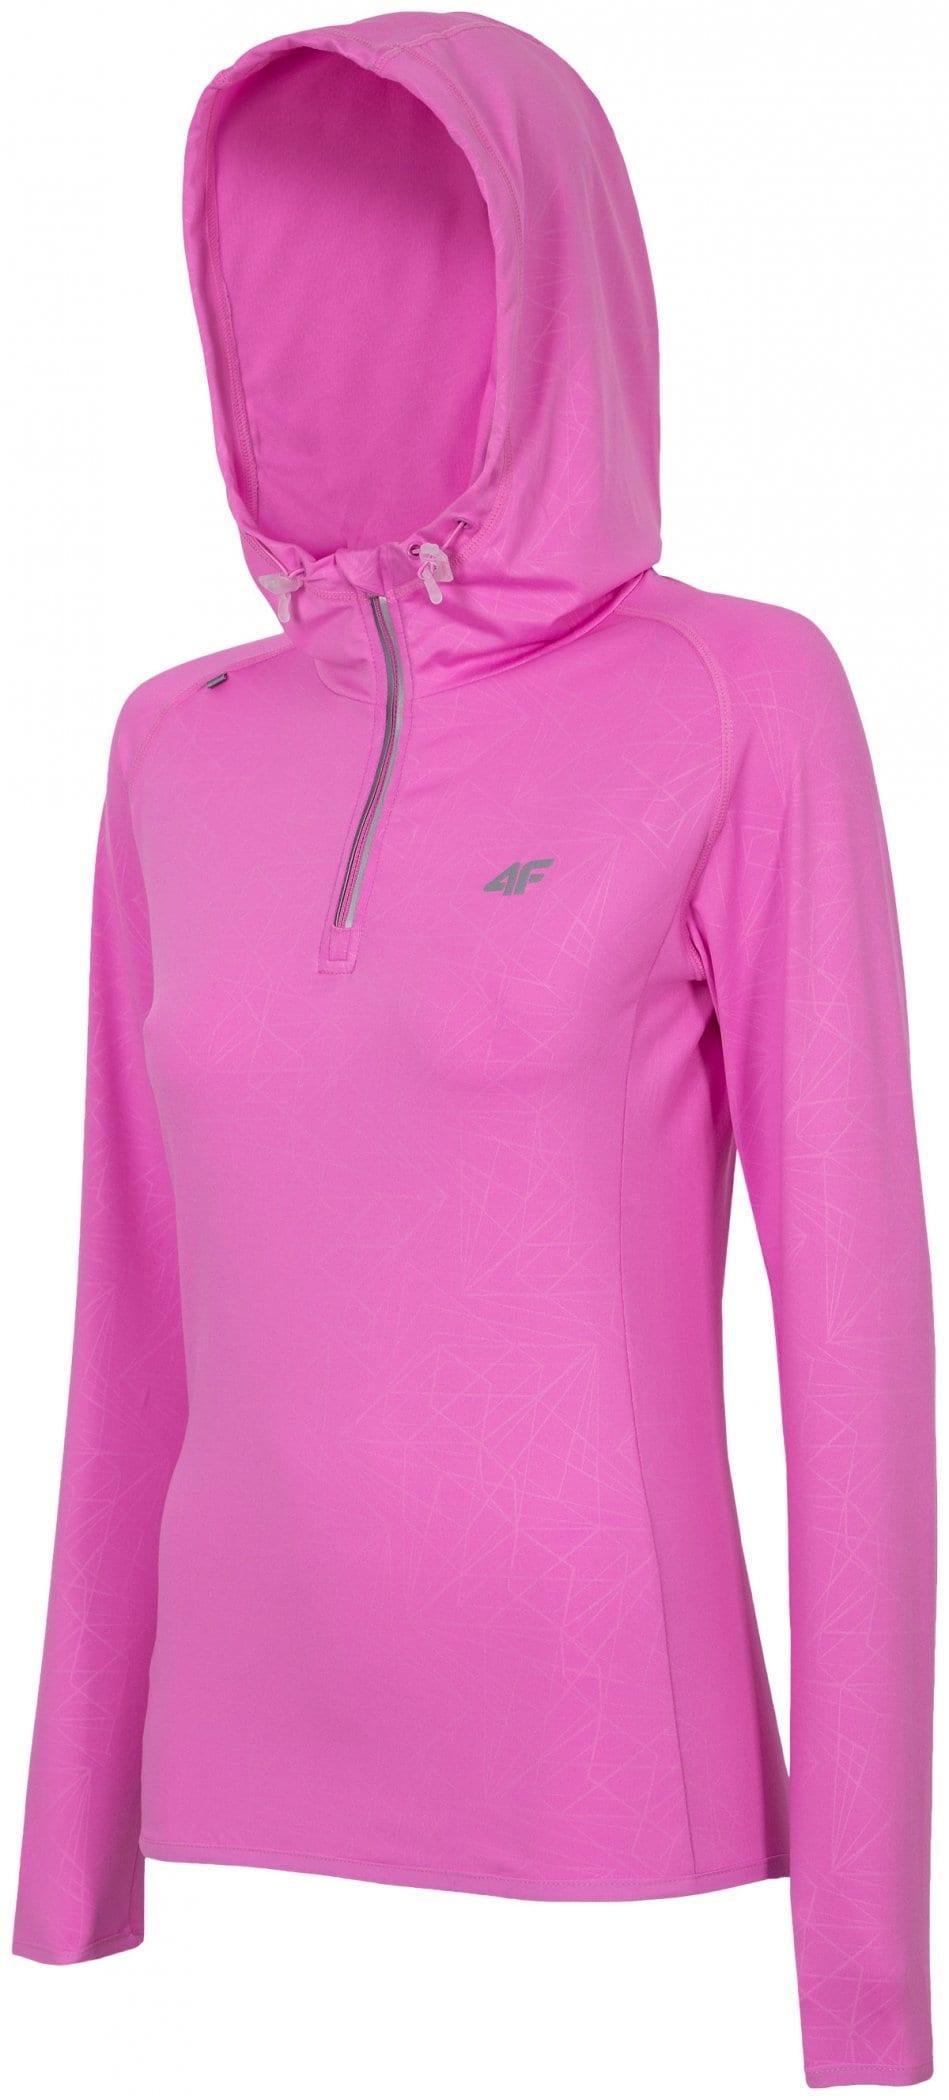 Bluza treningowa damska BLDF001 - neonowy róż